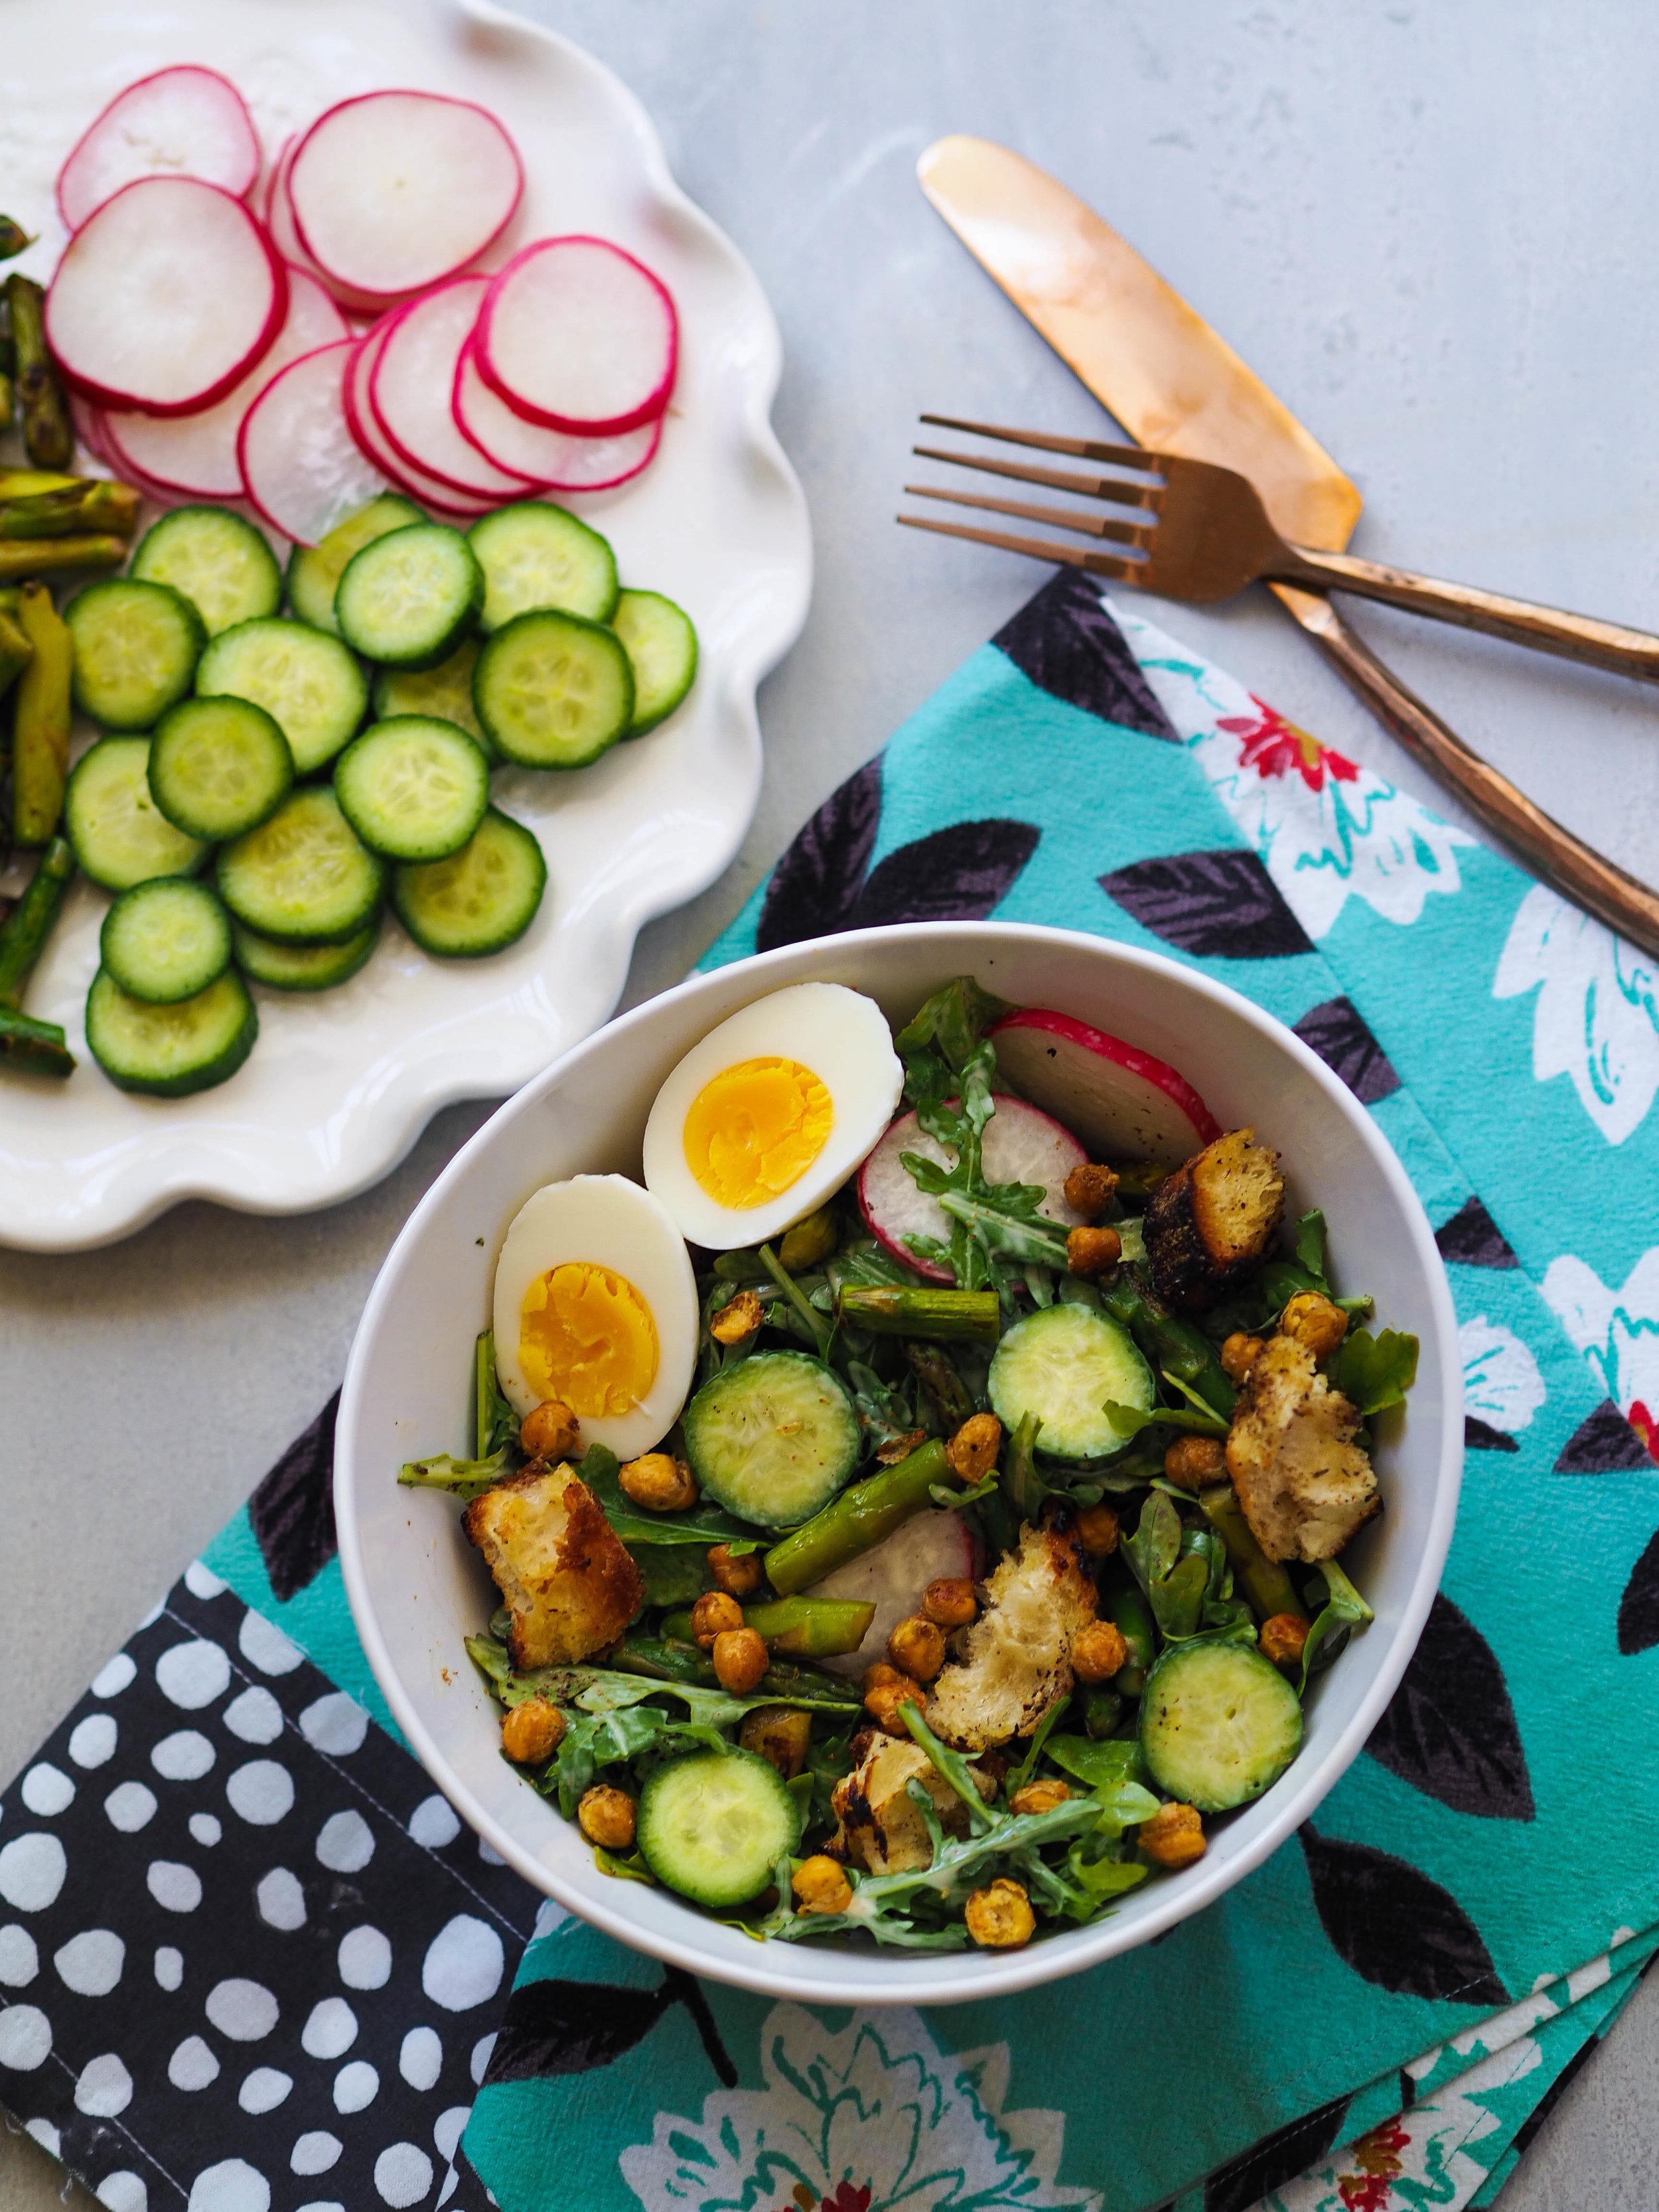 Spring Caesar salad with roasted chickpeas and za'atar croutons! #salad #spring #healthyrecipe #asparagus #vegetarian